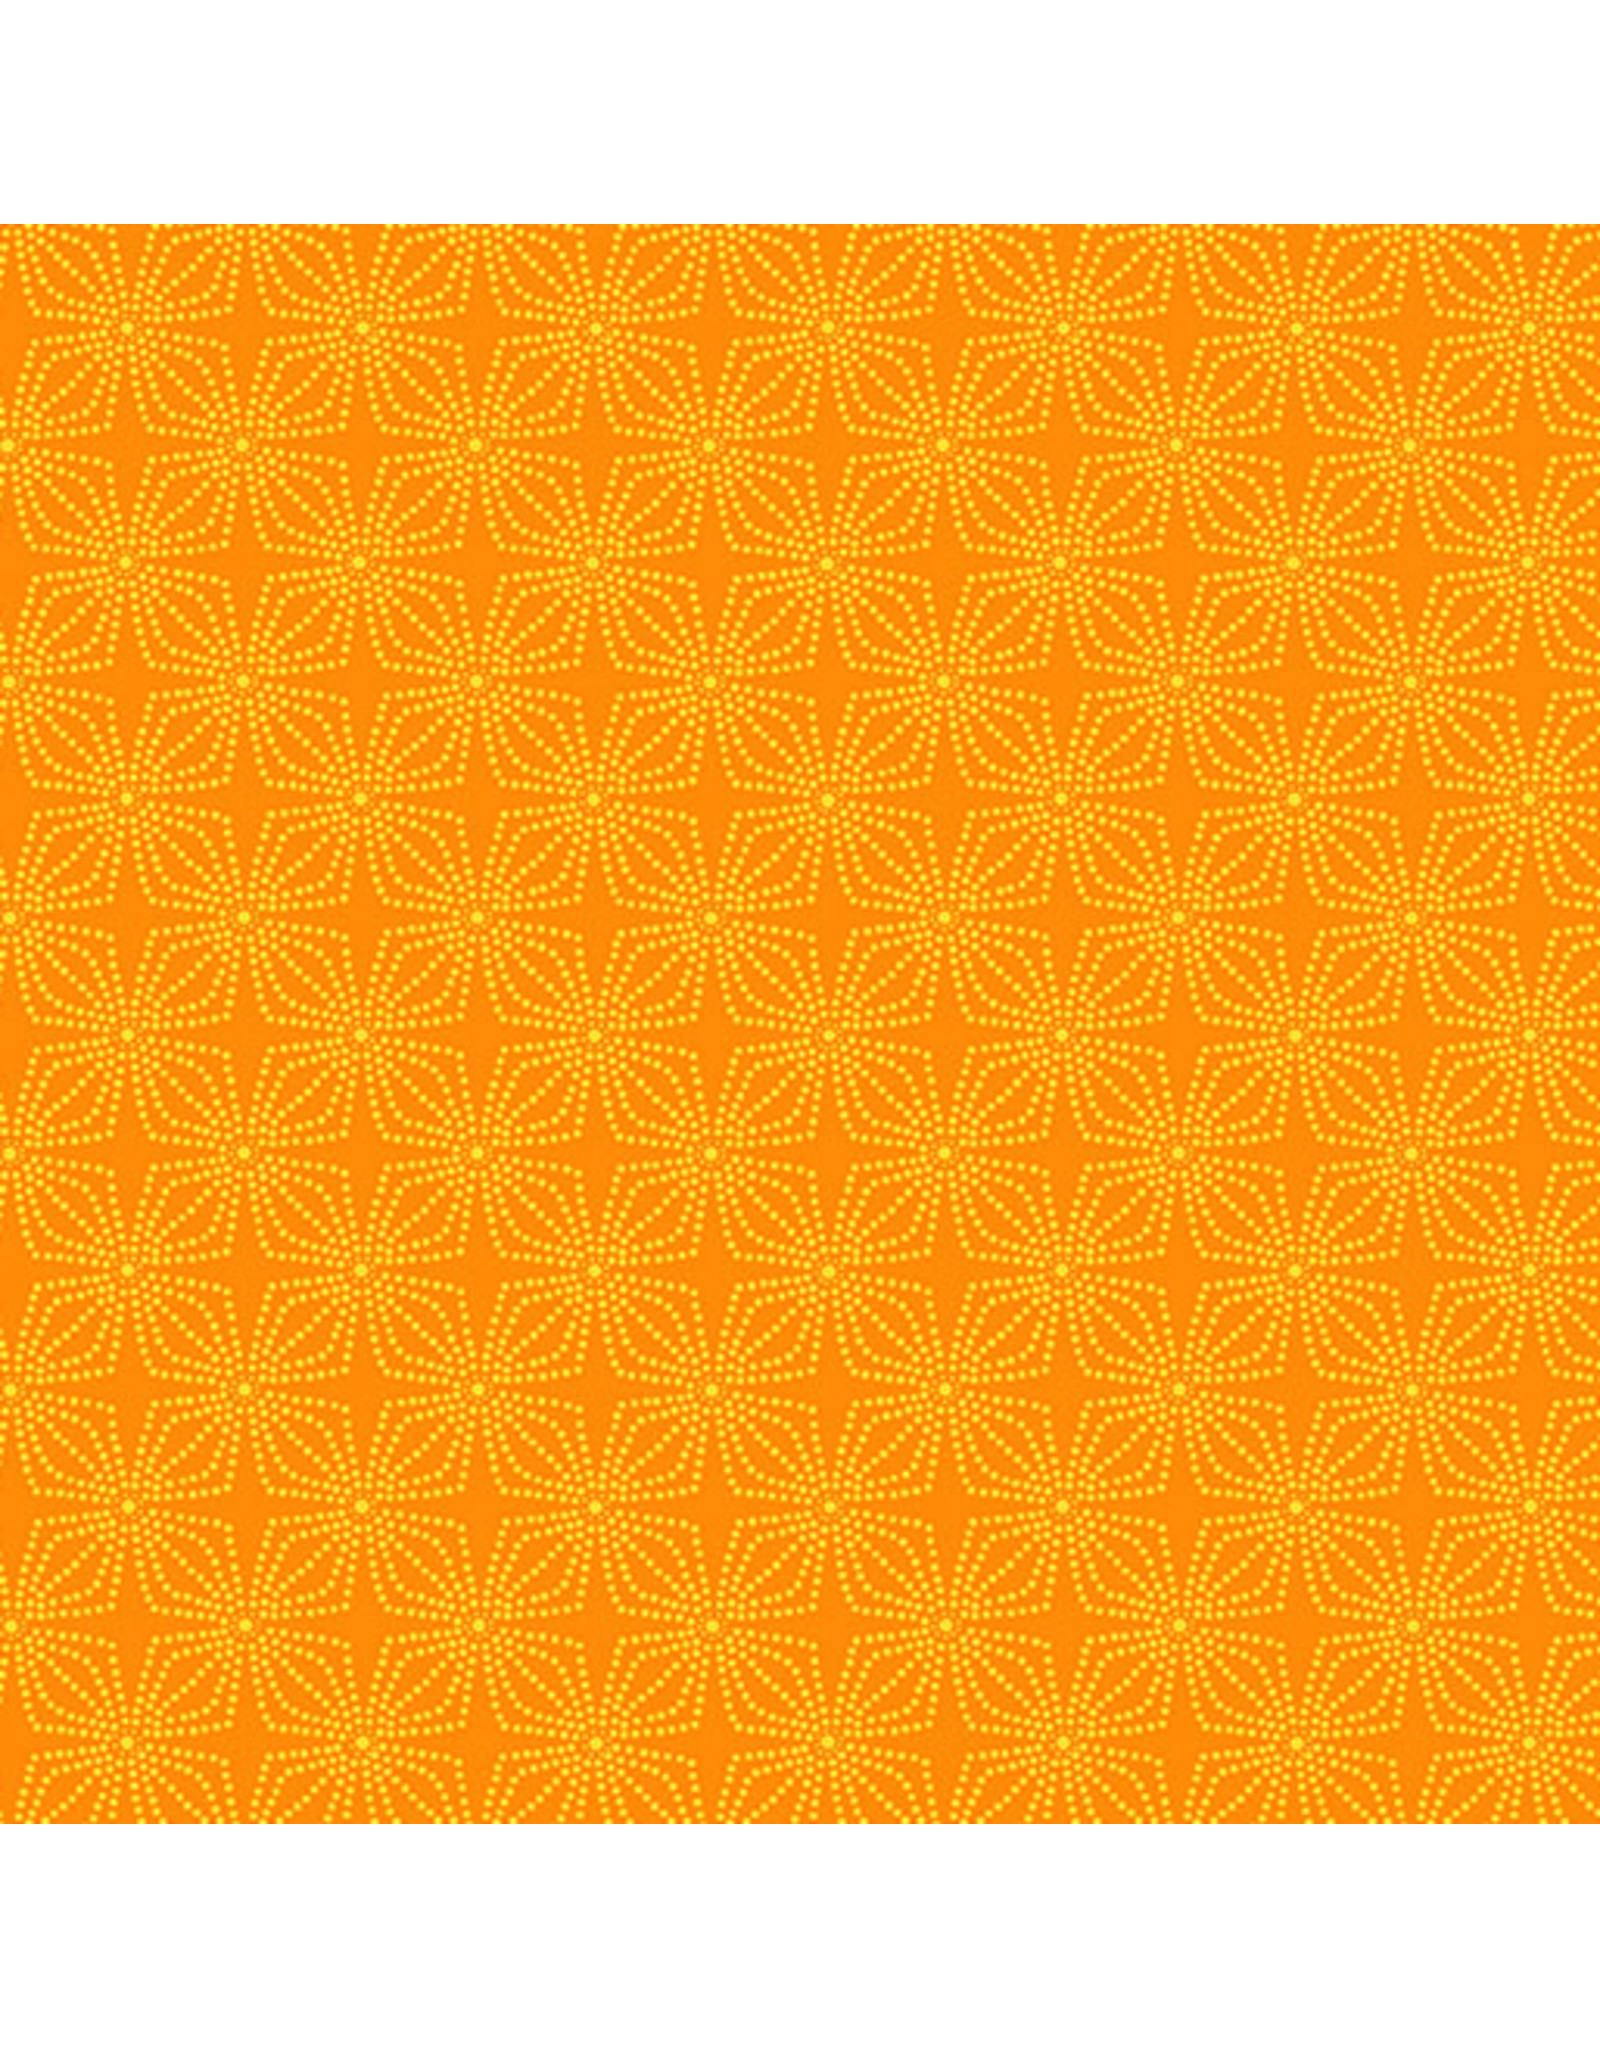 Kanvas Studio Geo Bloom - Orange